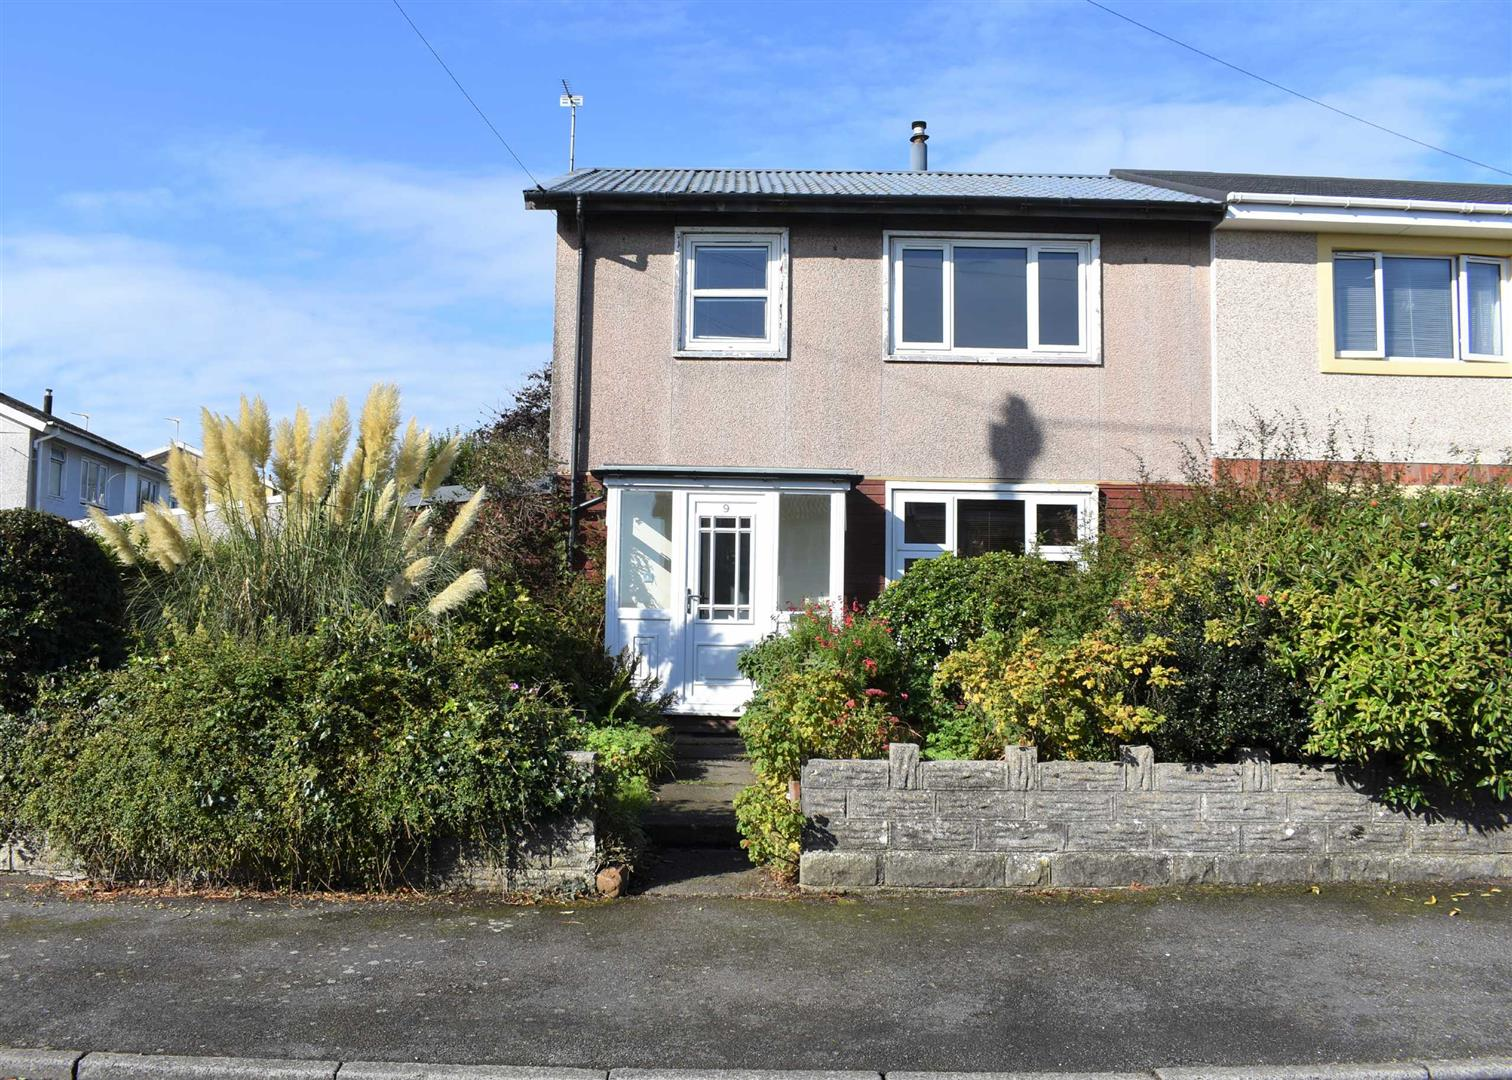 Sycamore Road, West Cross, Swansea, SA3 5LB